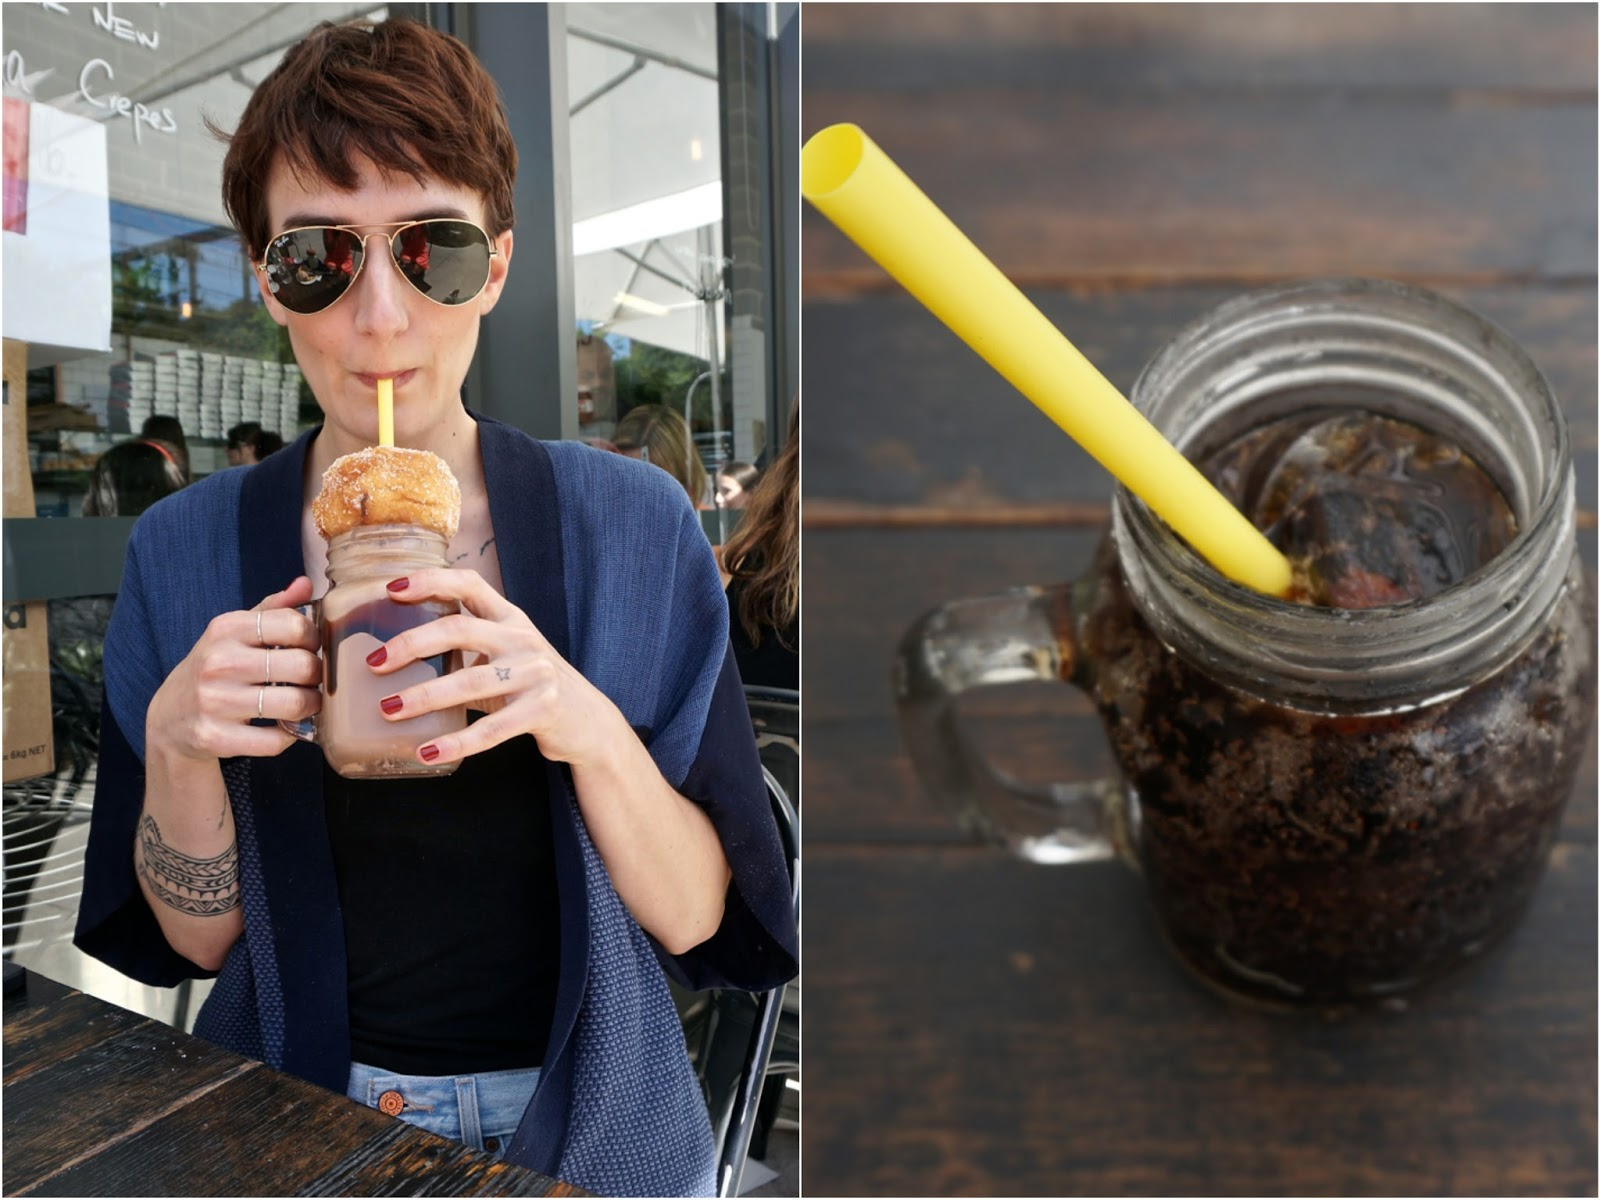 foodcraft espresso and bakery burgers tella balls milkshake Ttotaler tea good adresse Sydney Australia lexie blush